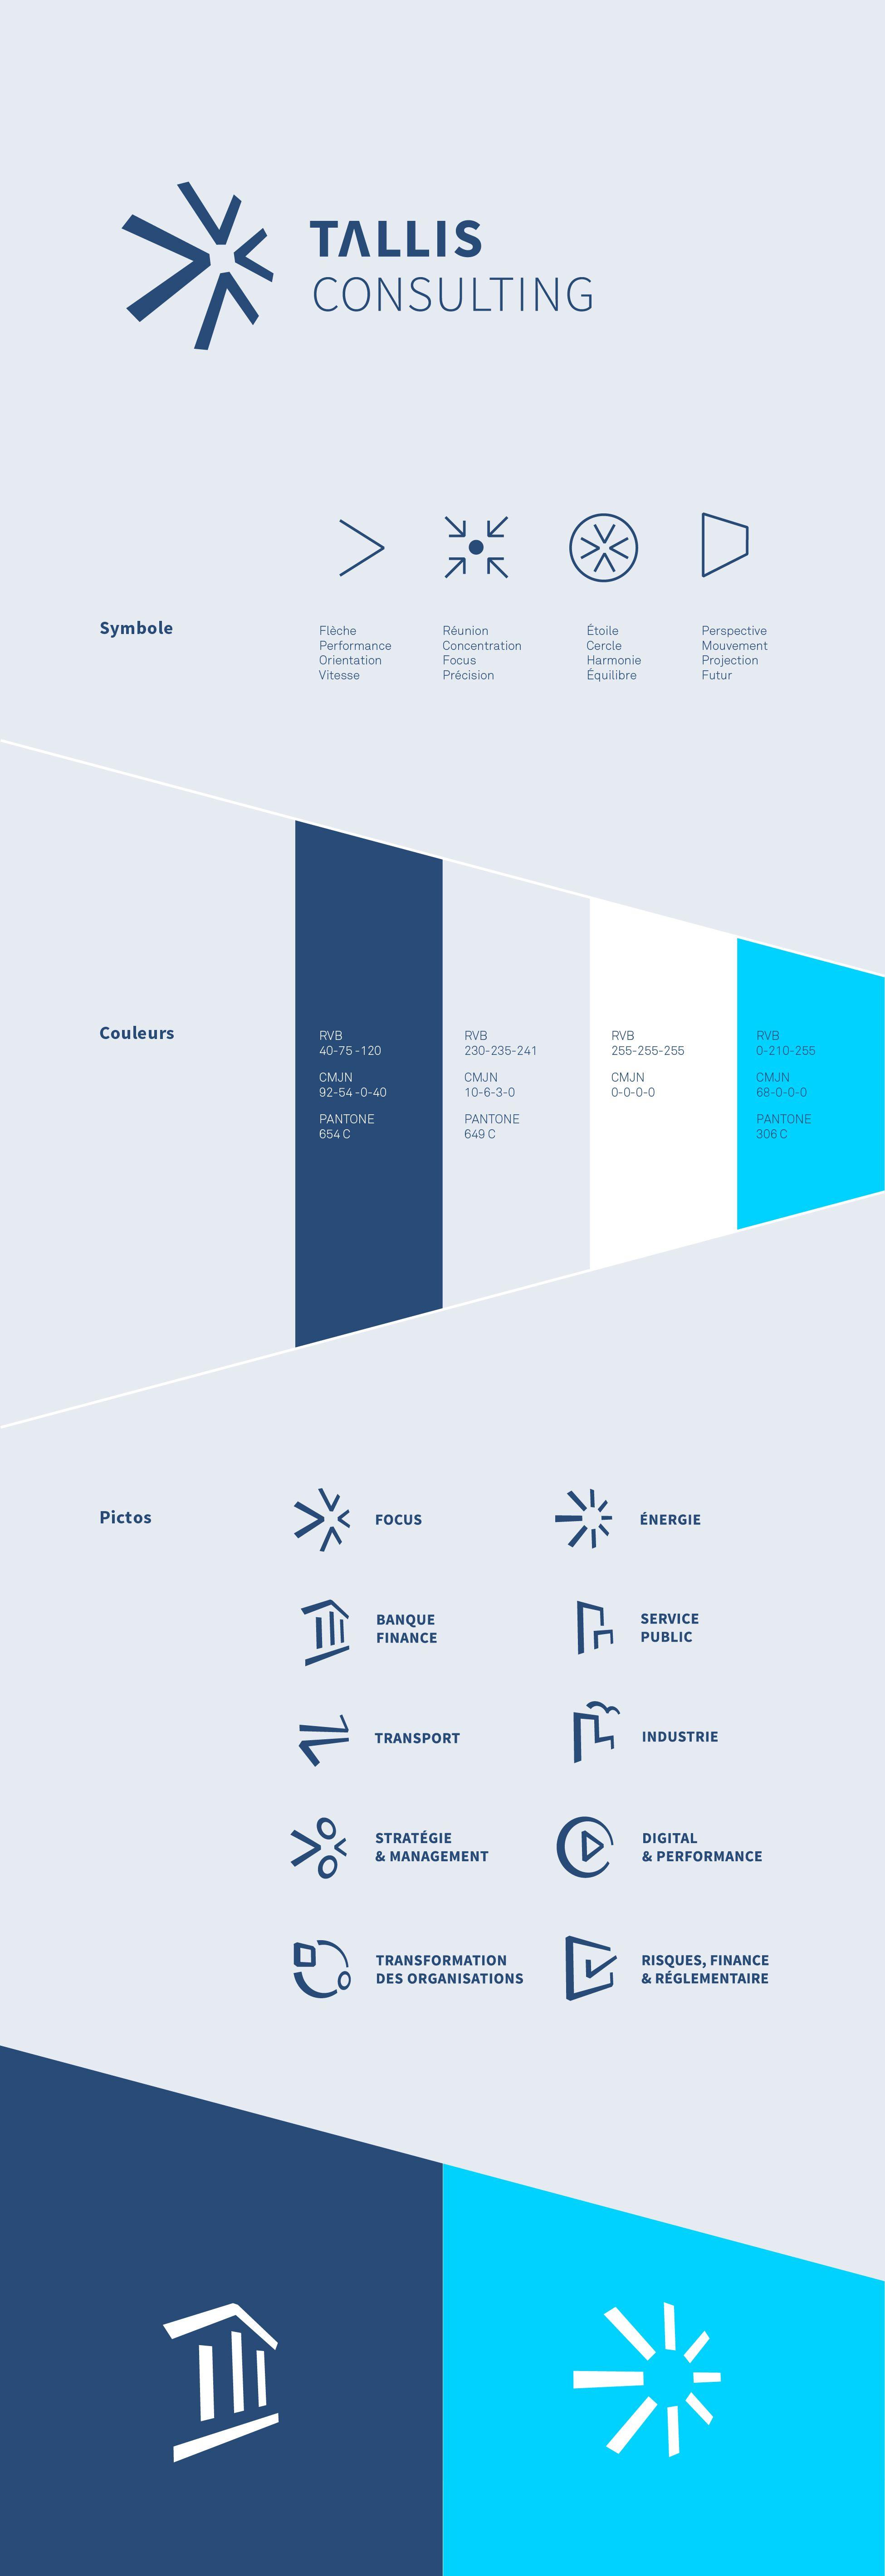 Tallis Consulting Identité Visuelle Icon Pinterest Branding